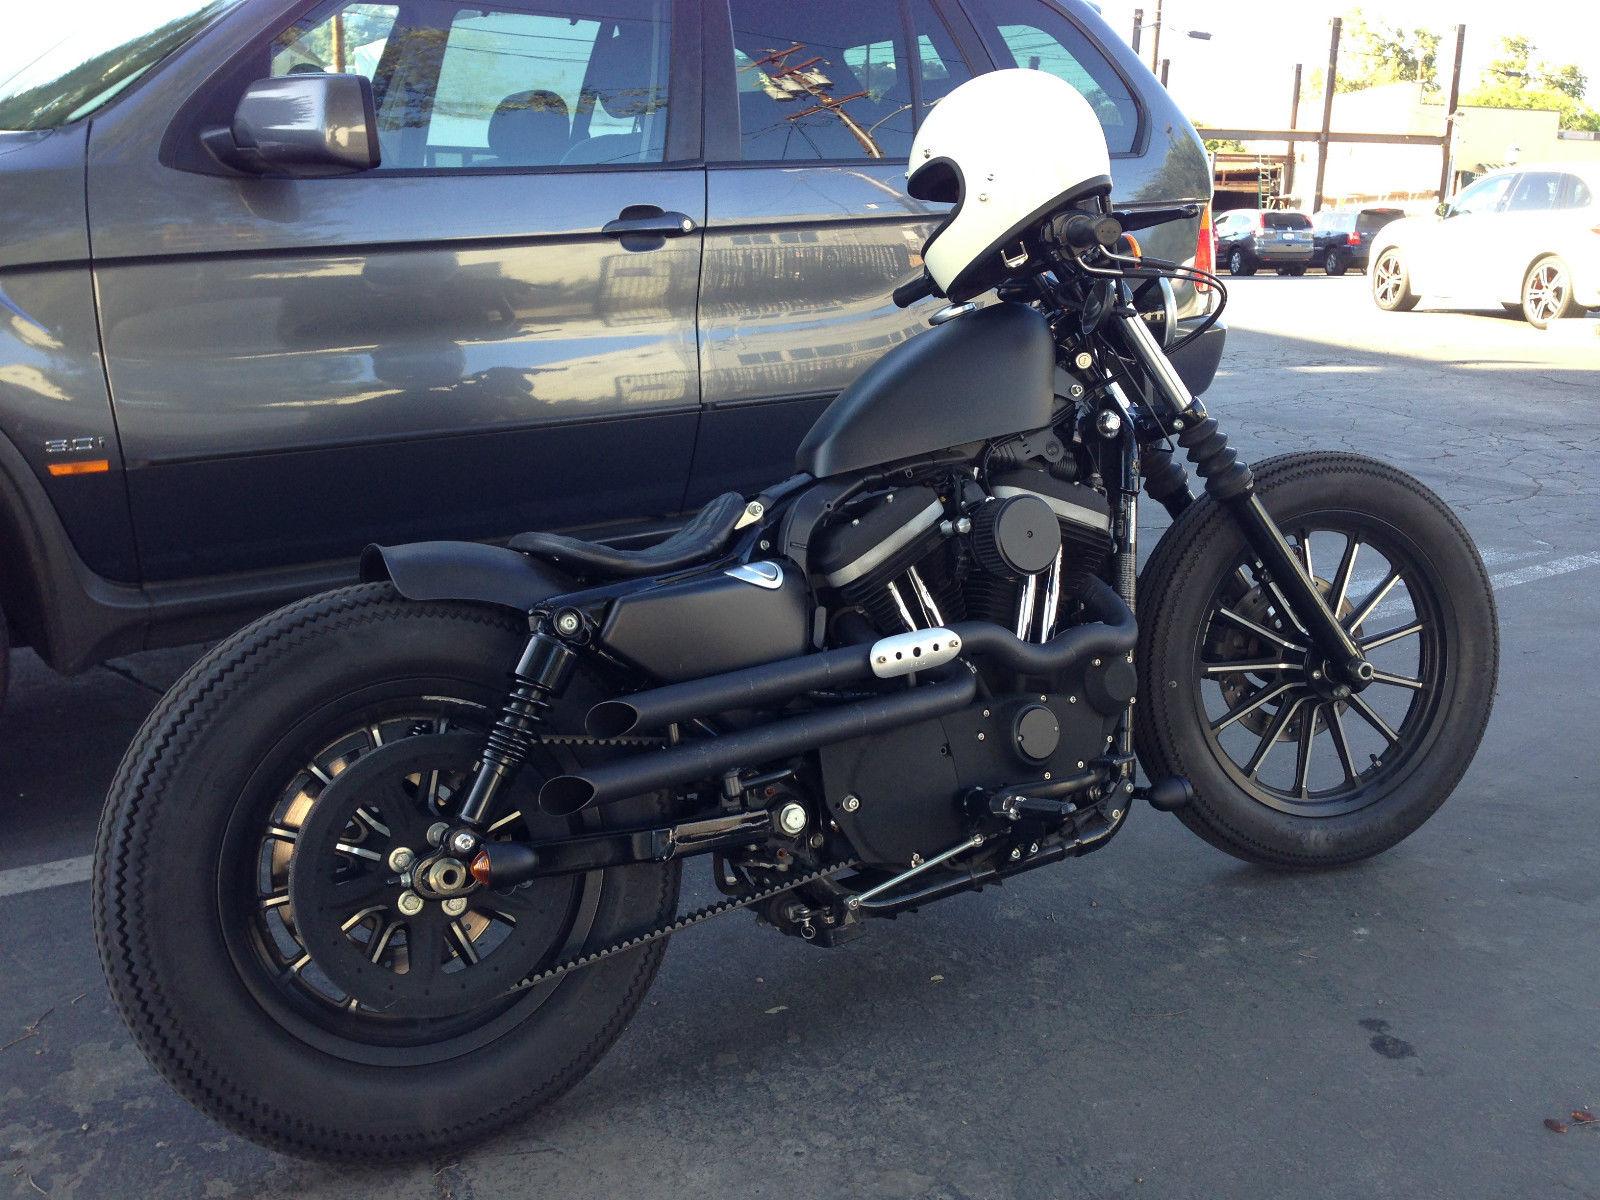 2010 Brat Style Harley Davidson Sportster Iron 883